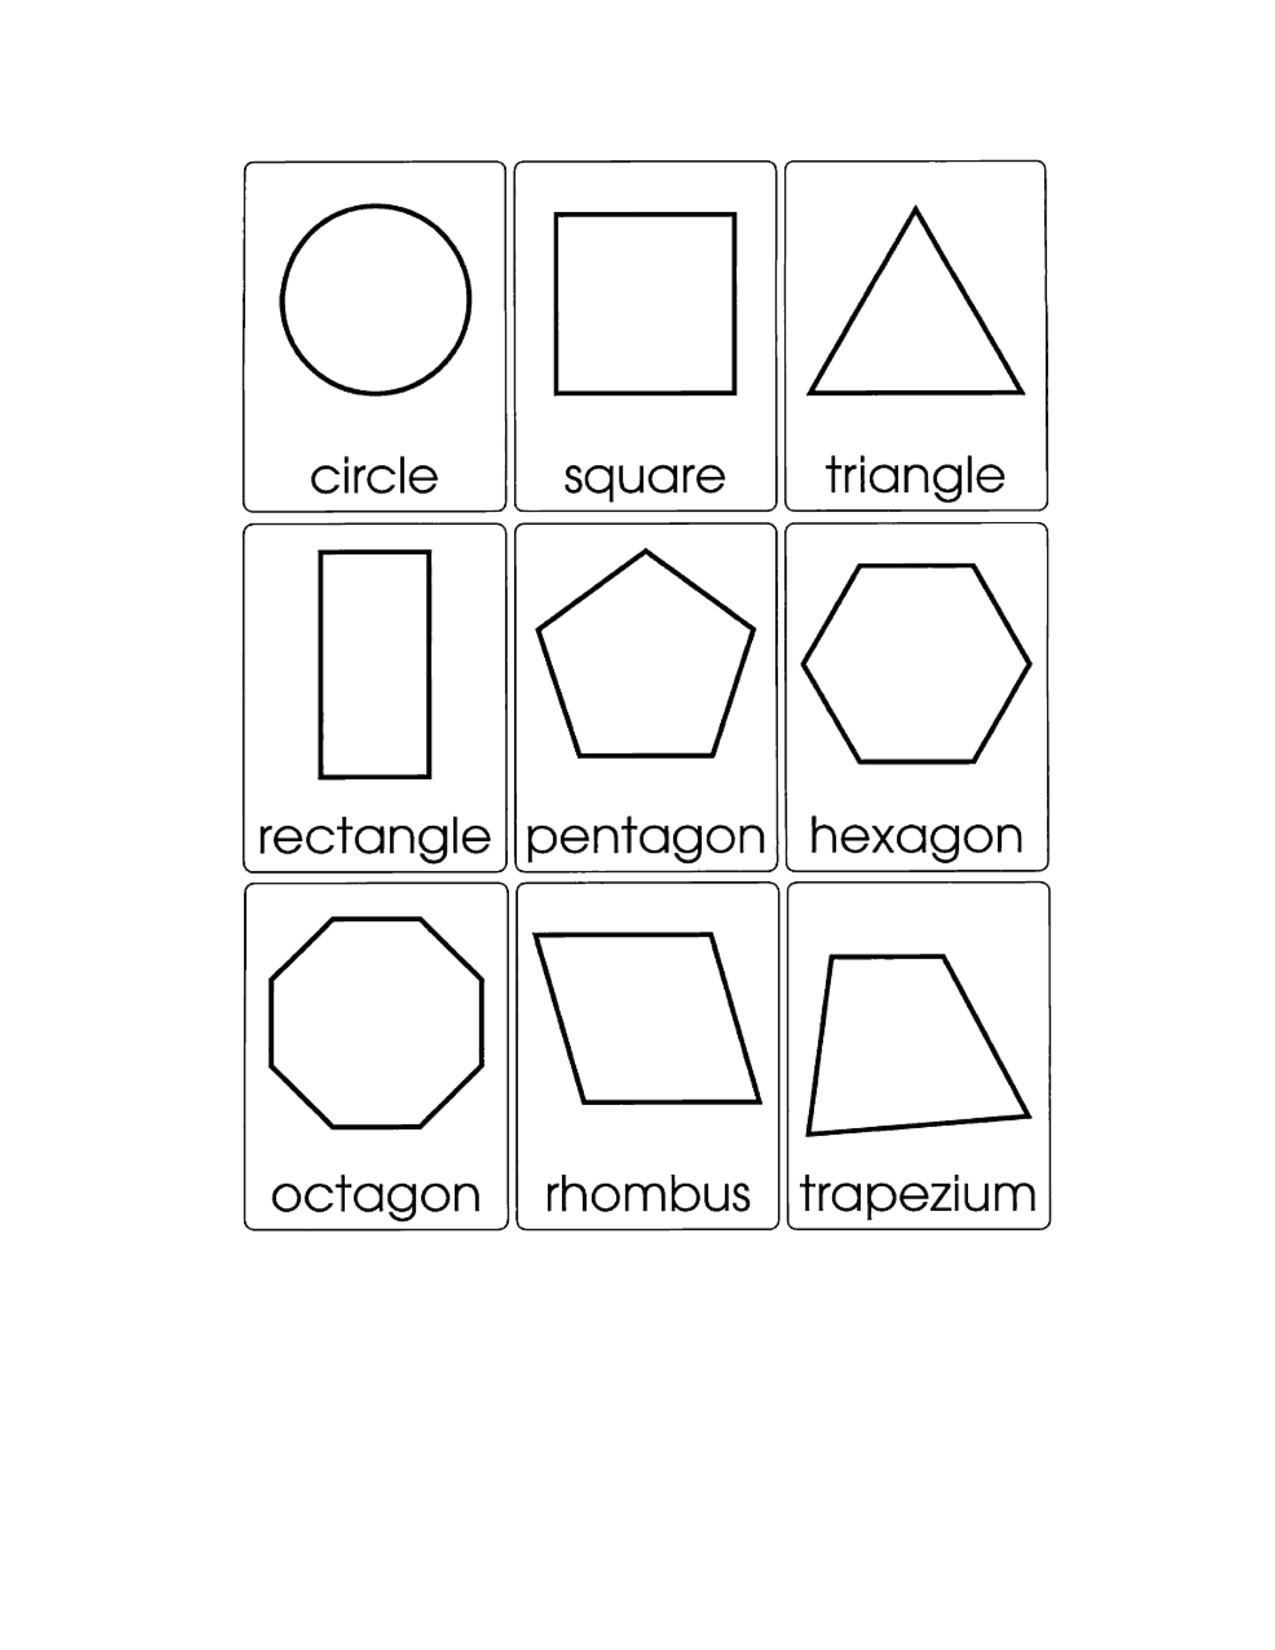 2d Shape Templates 15 Best Images Of Worksheets 3d Shapes Printable 3d